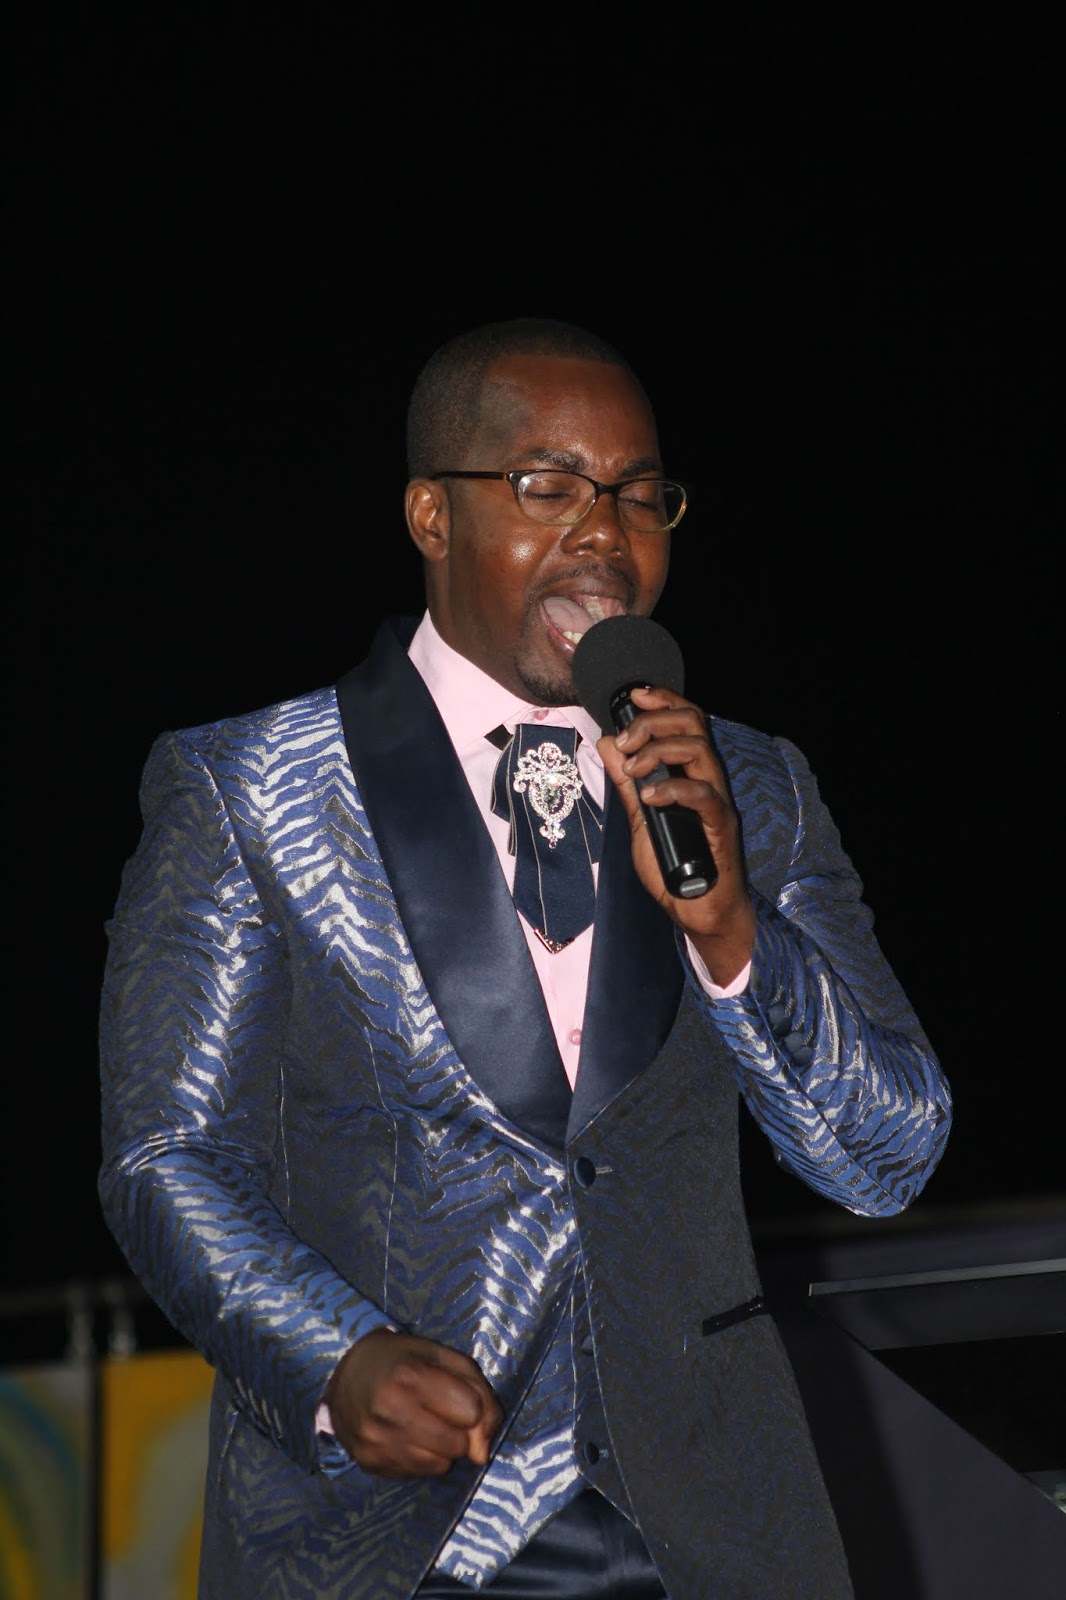 Shiloh Masenyama | The Ambassador Extraordinaire for Glory Ministries